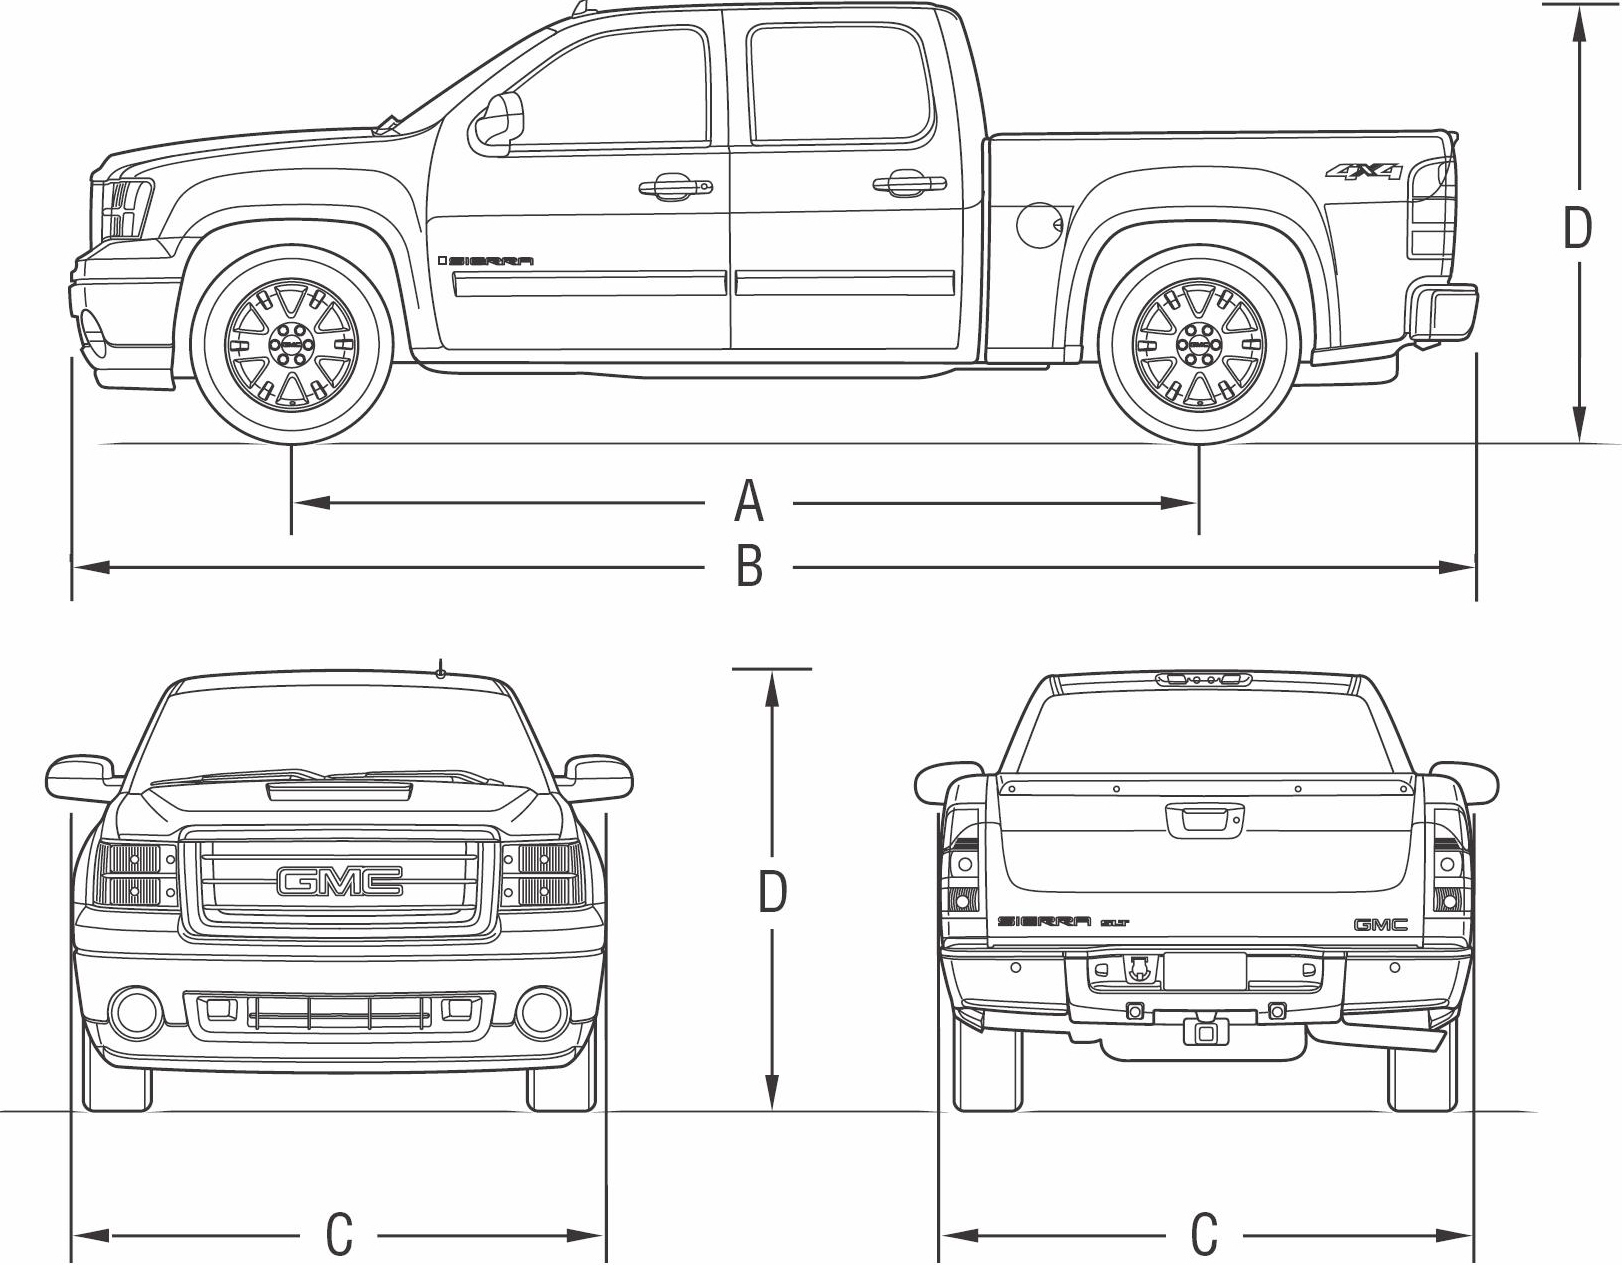 Drawn truck gmc sierra (2007) Sierra JPG Forum SMCars